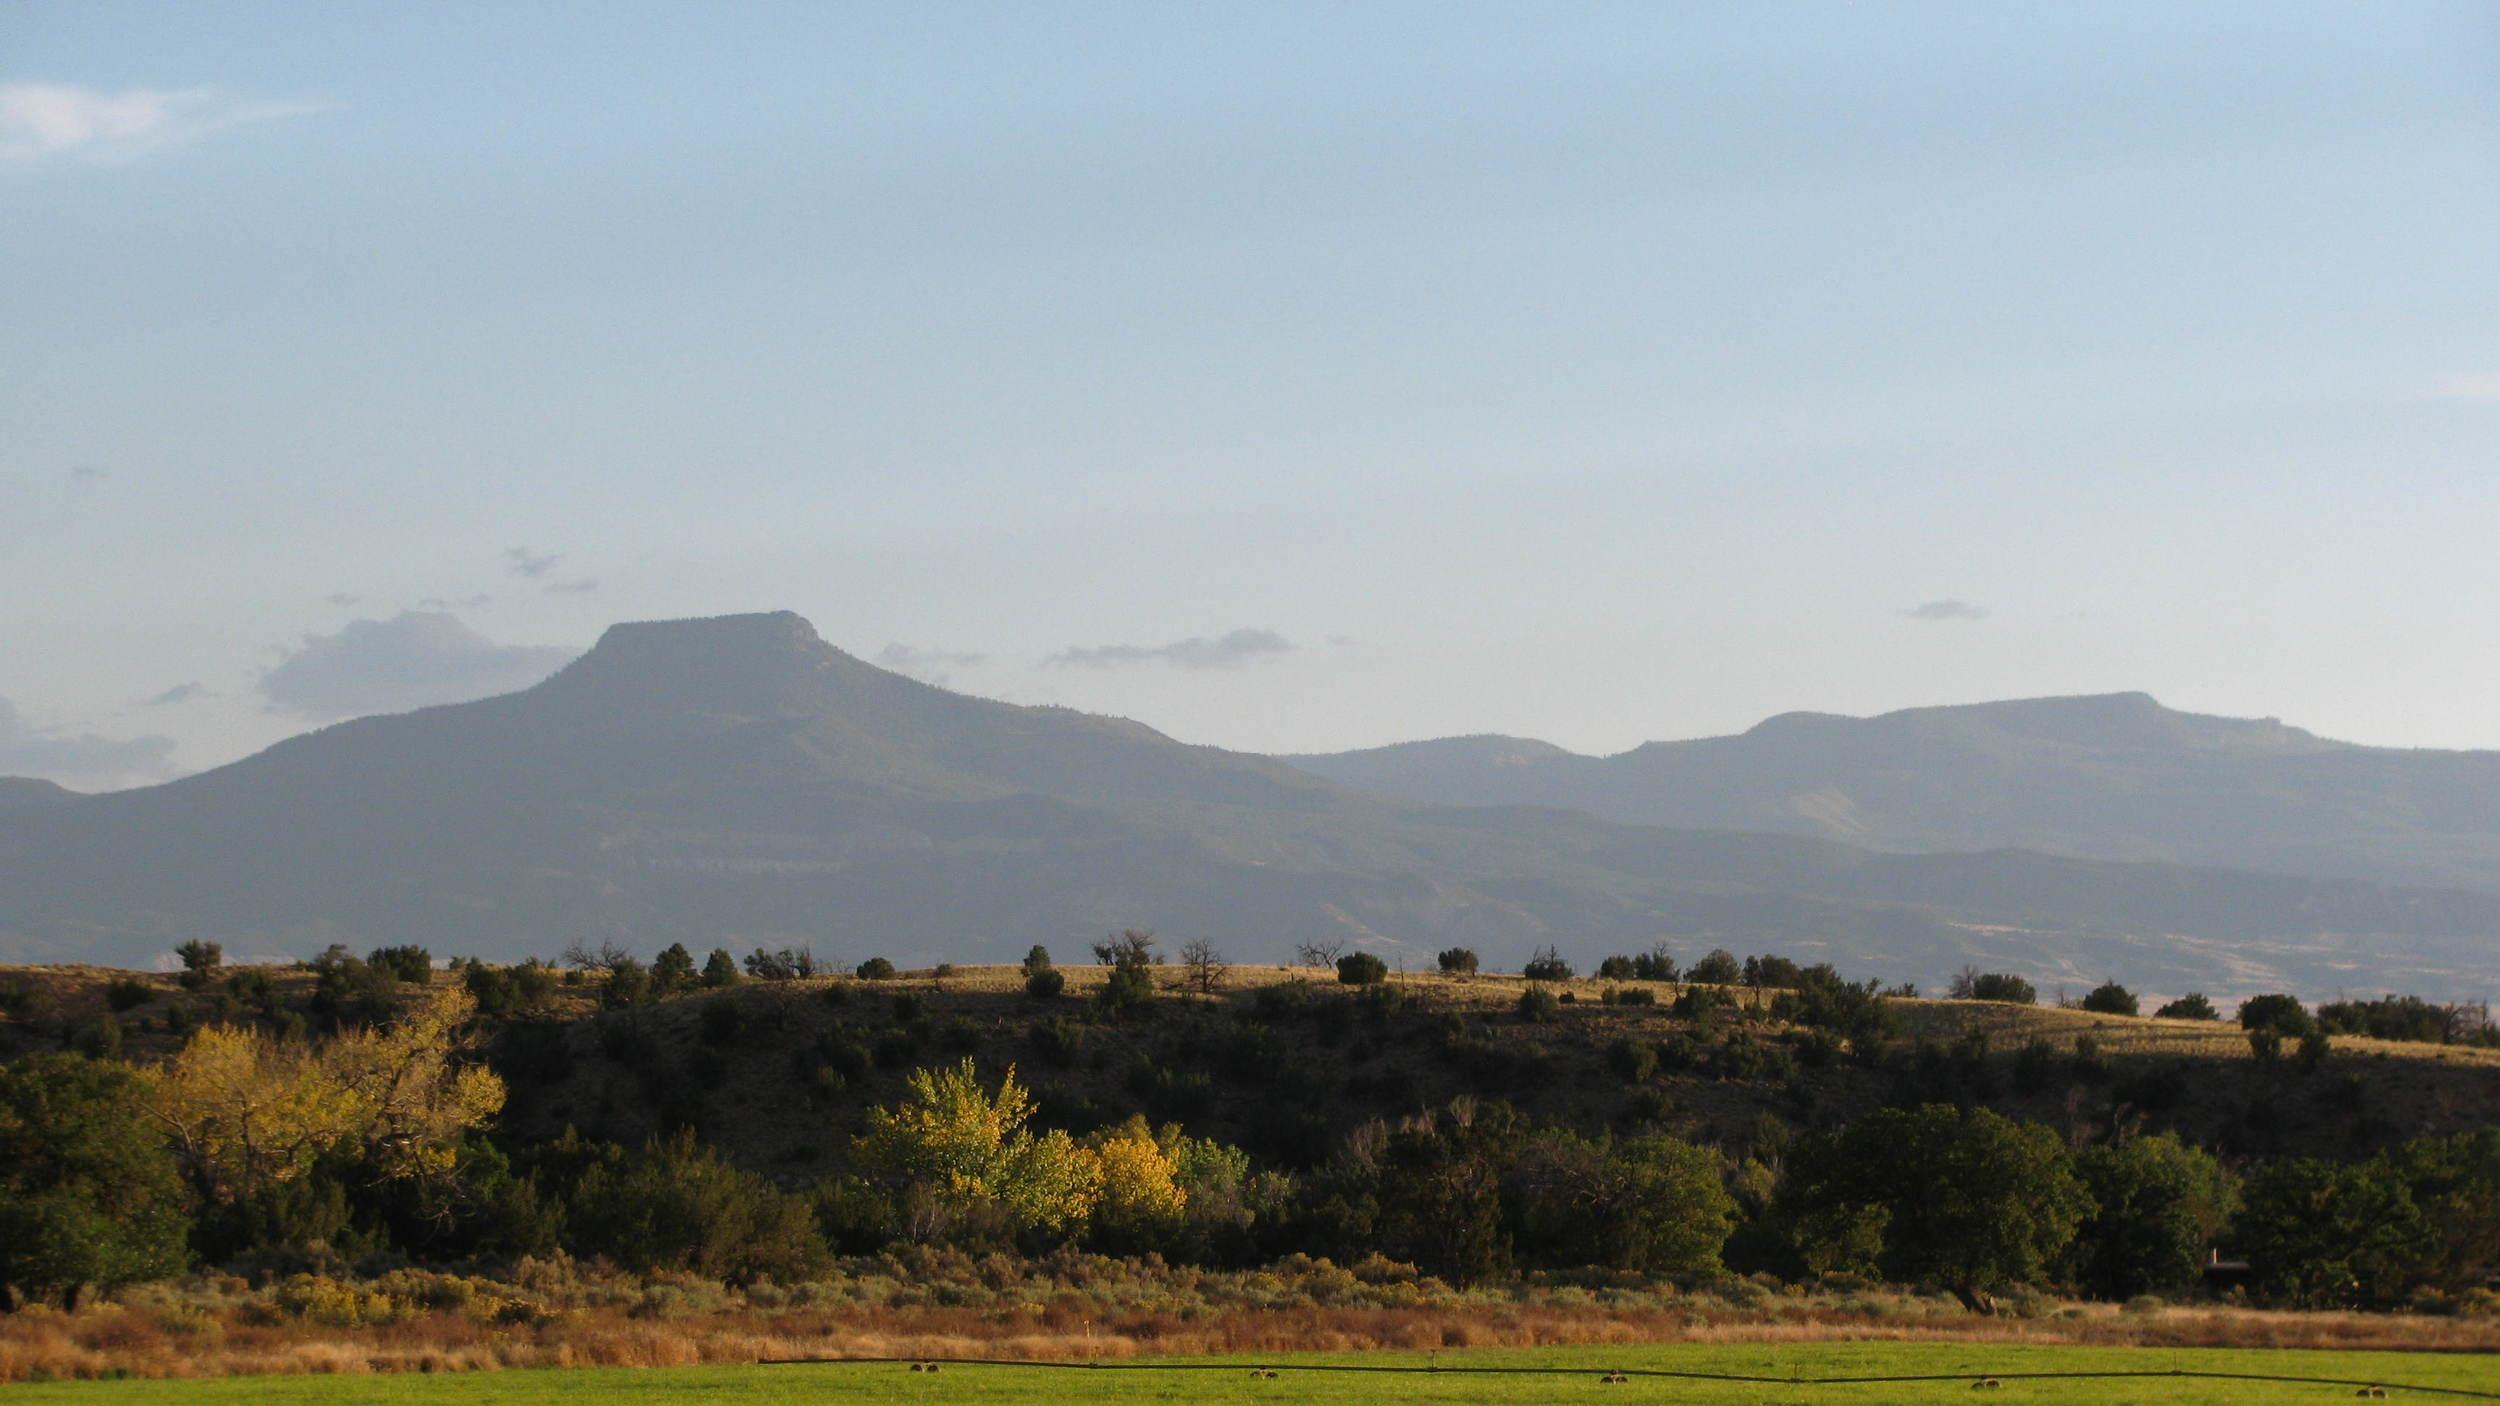 Copy of New Mexico 2010 144.jpg